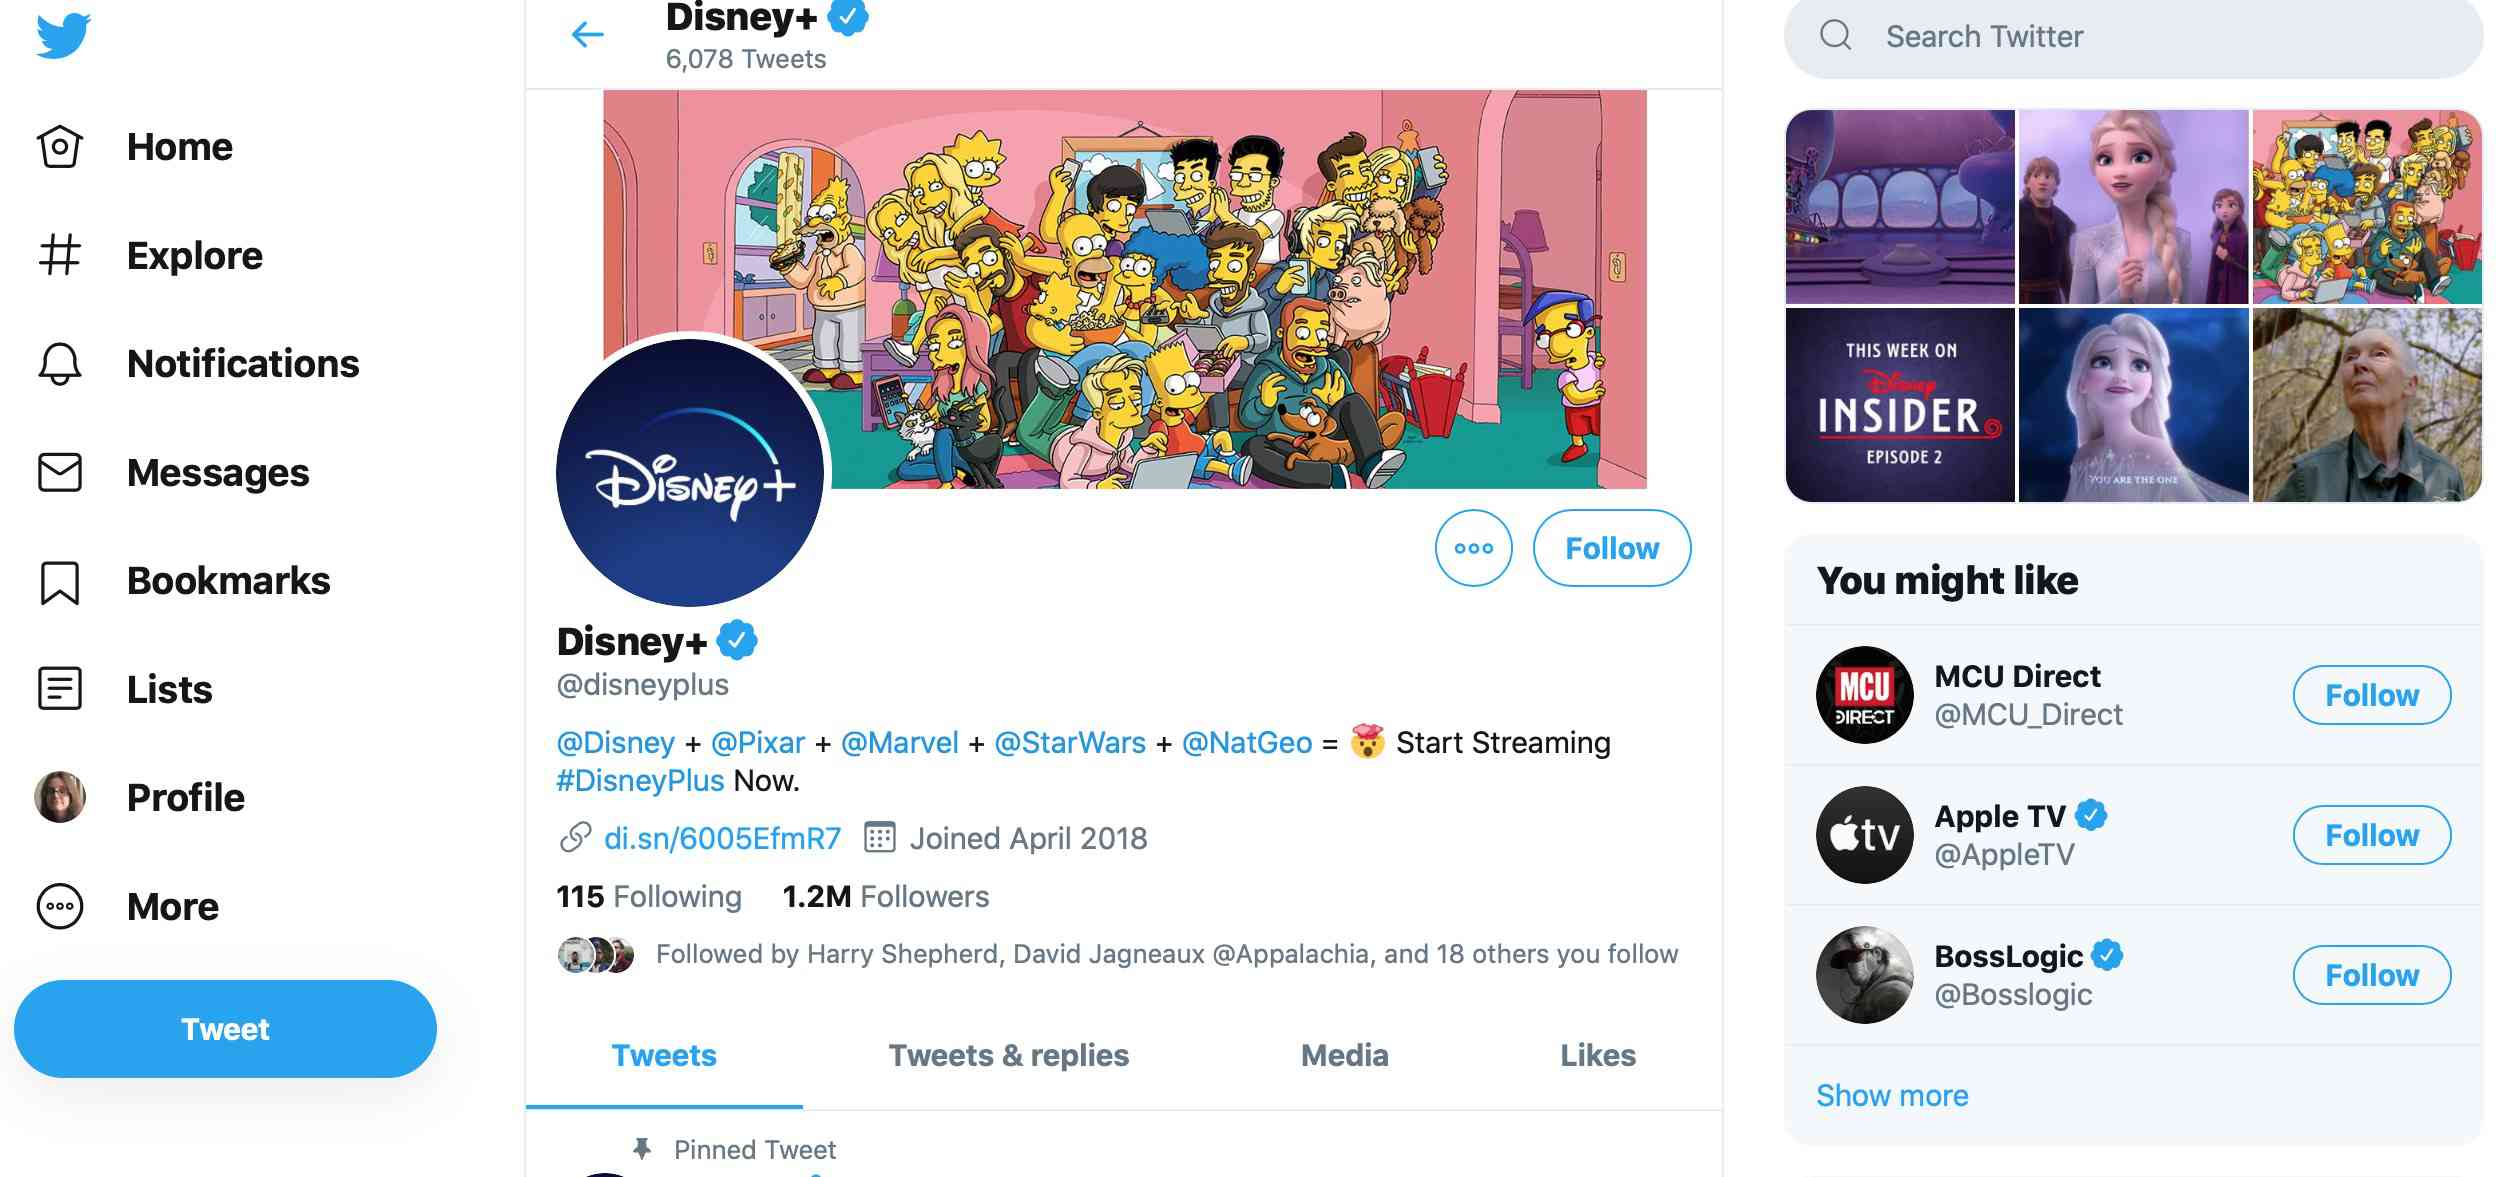 Disney Plus Twitter account